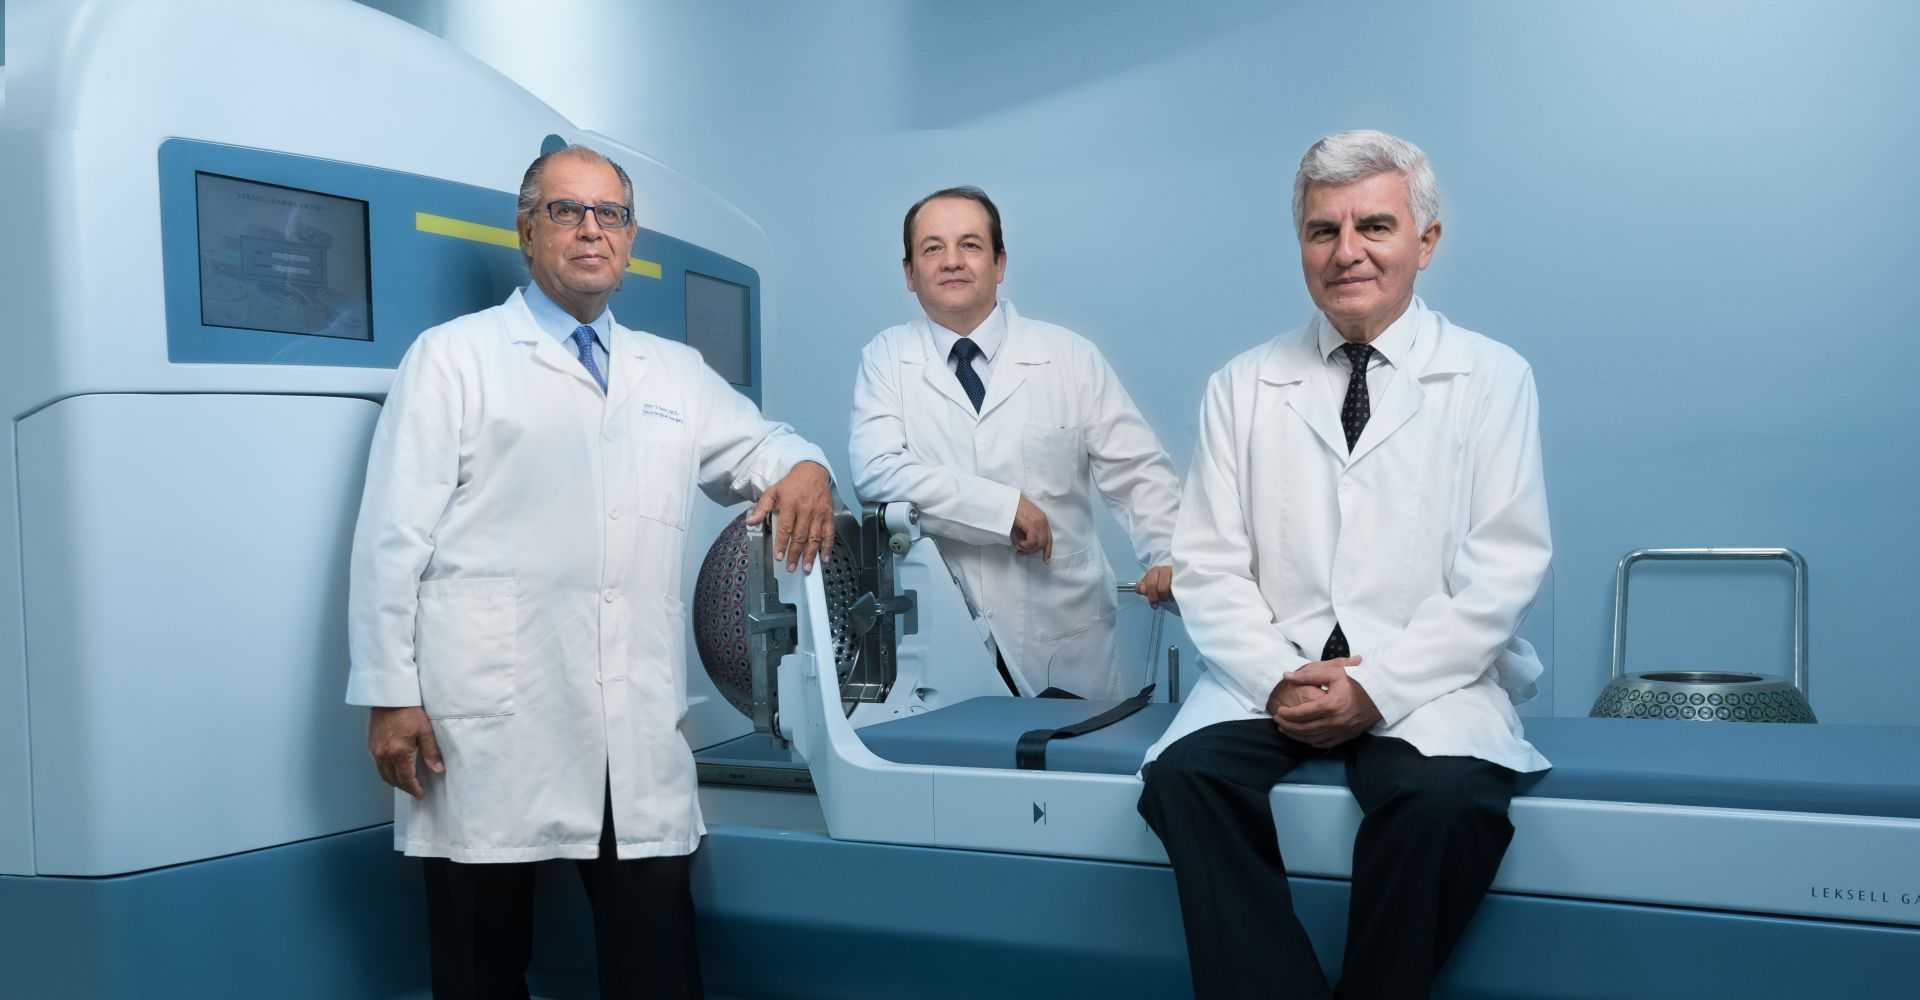 doctores de gamma knife sentados frente a la maquina de radiocirugia